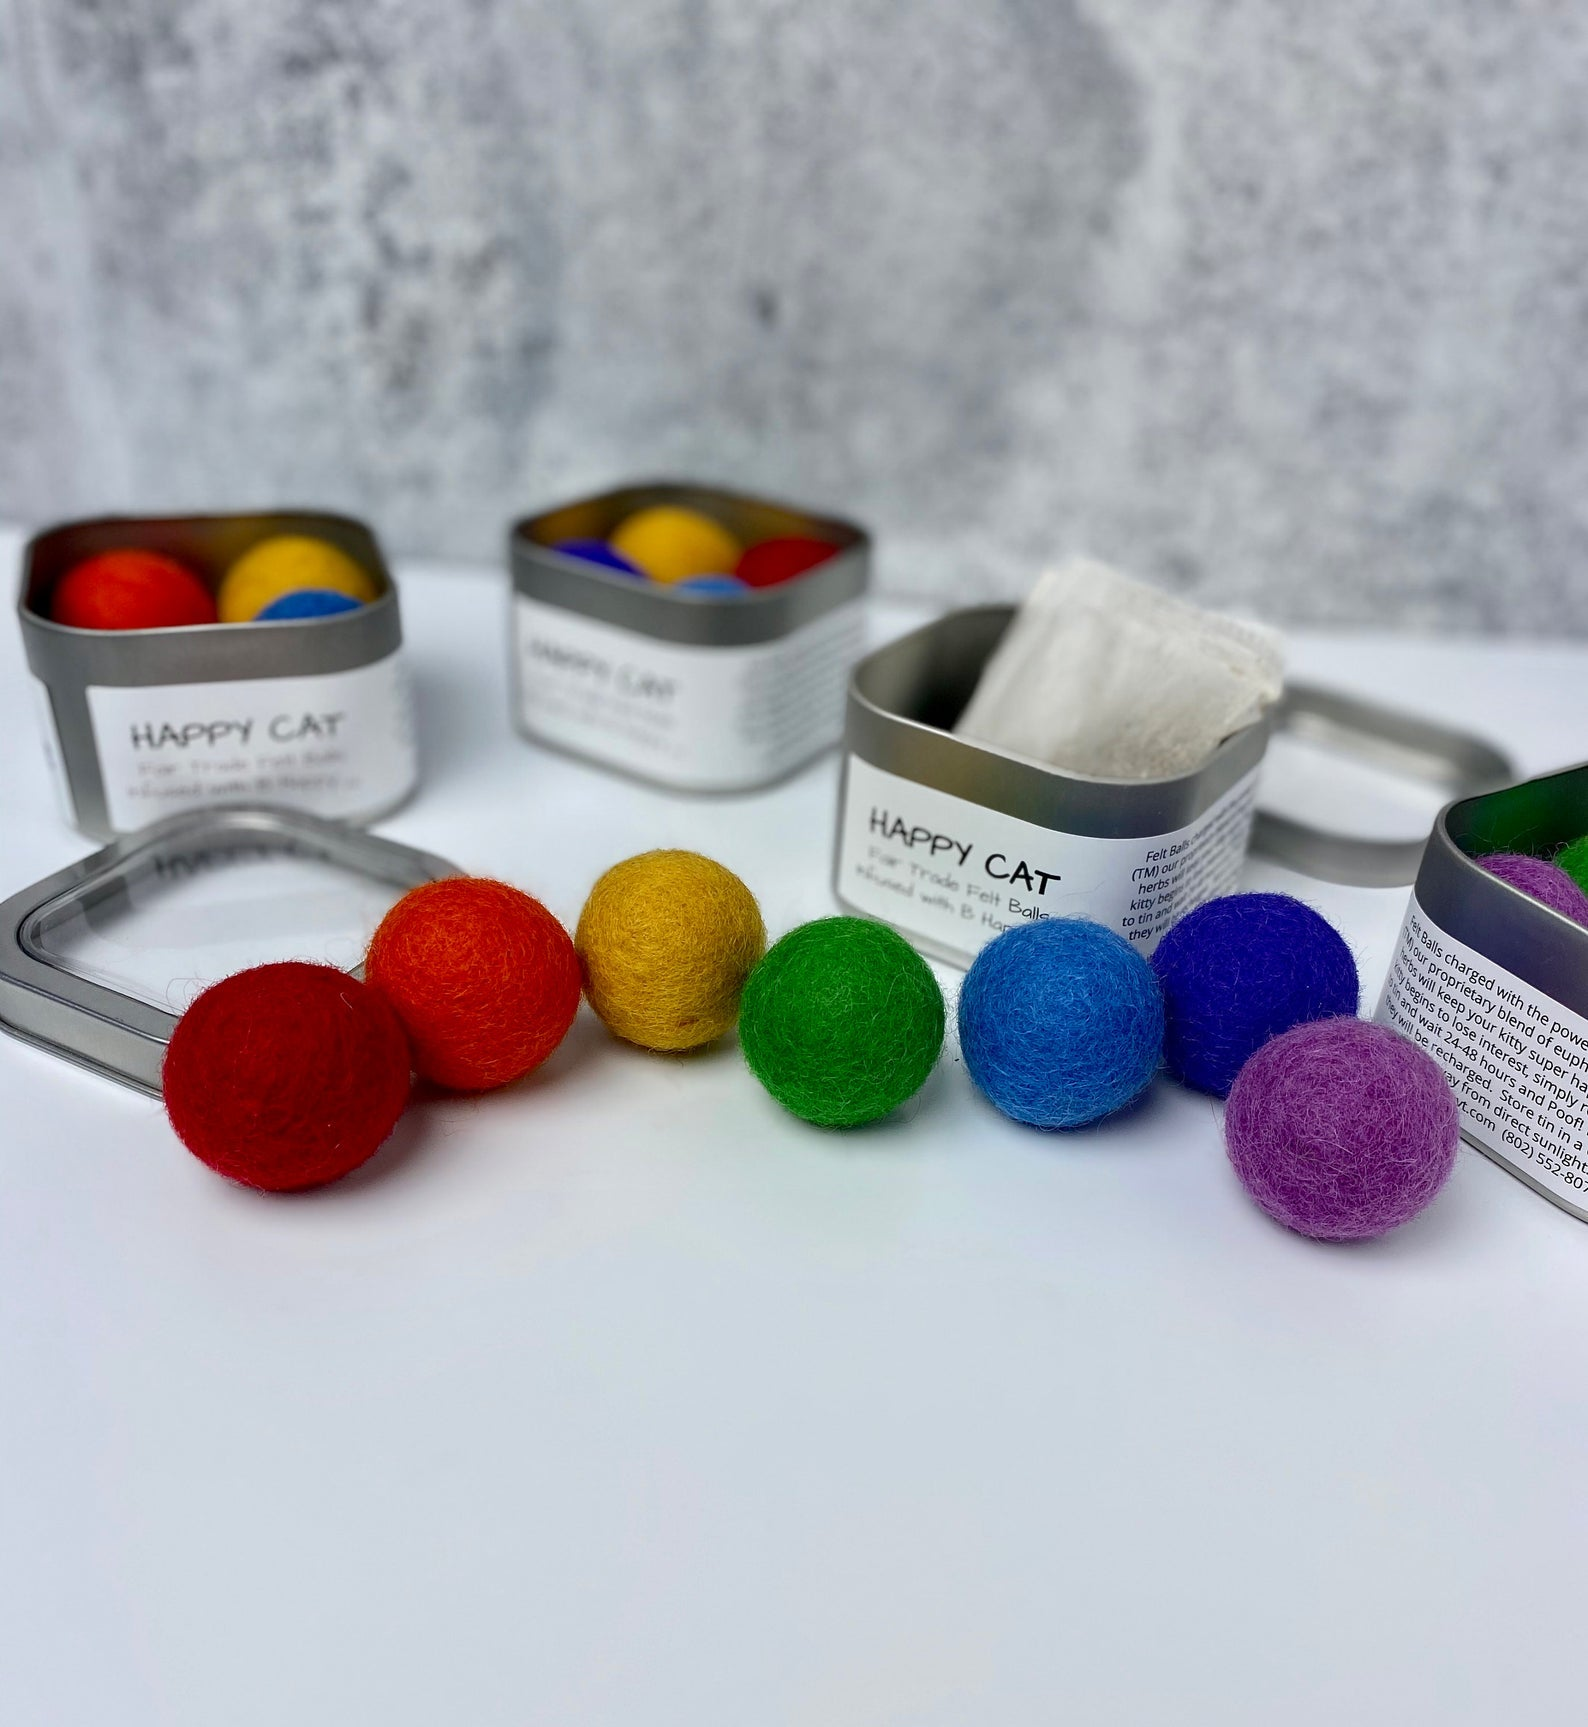 set of colorful catnip infused felt balls